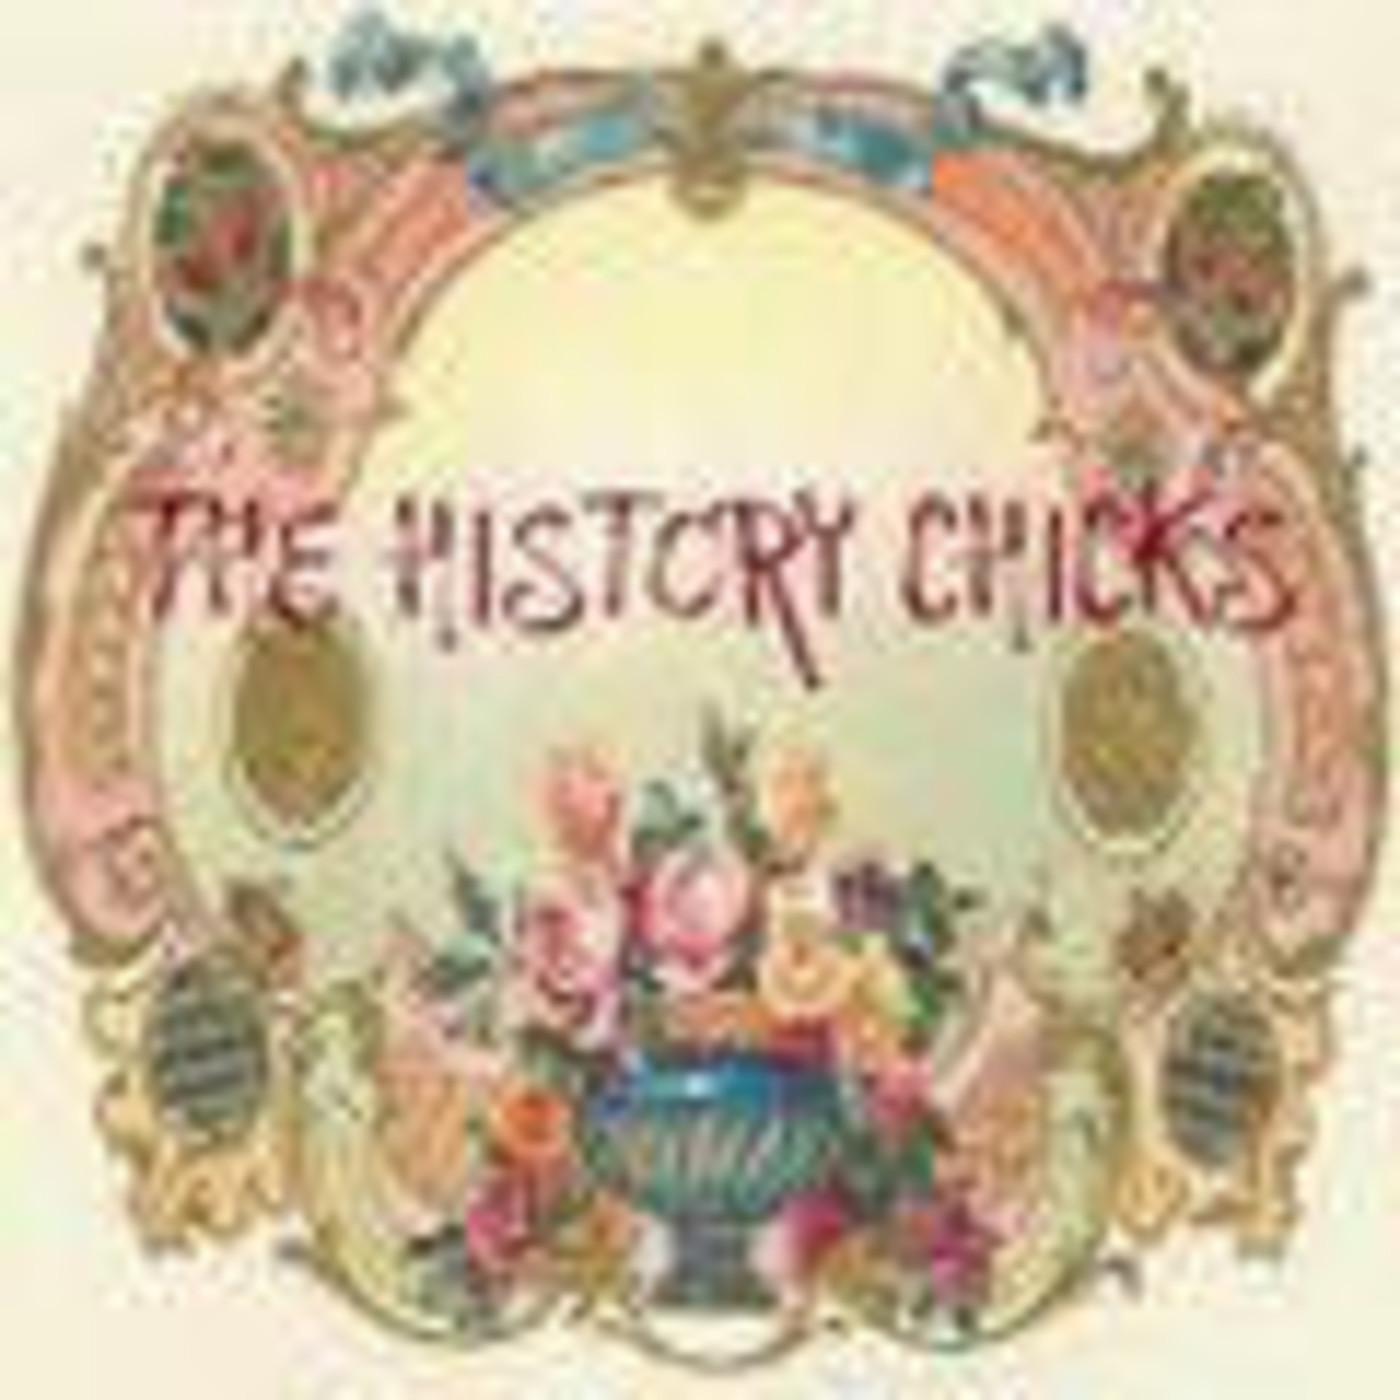 The History Chicks